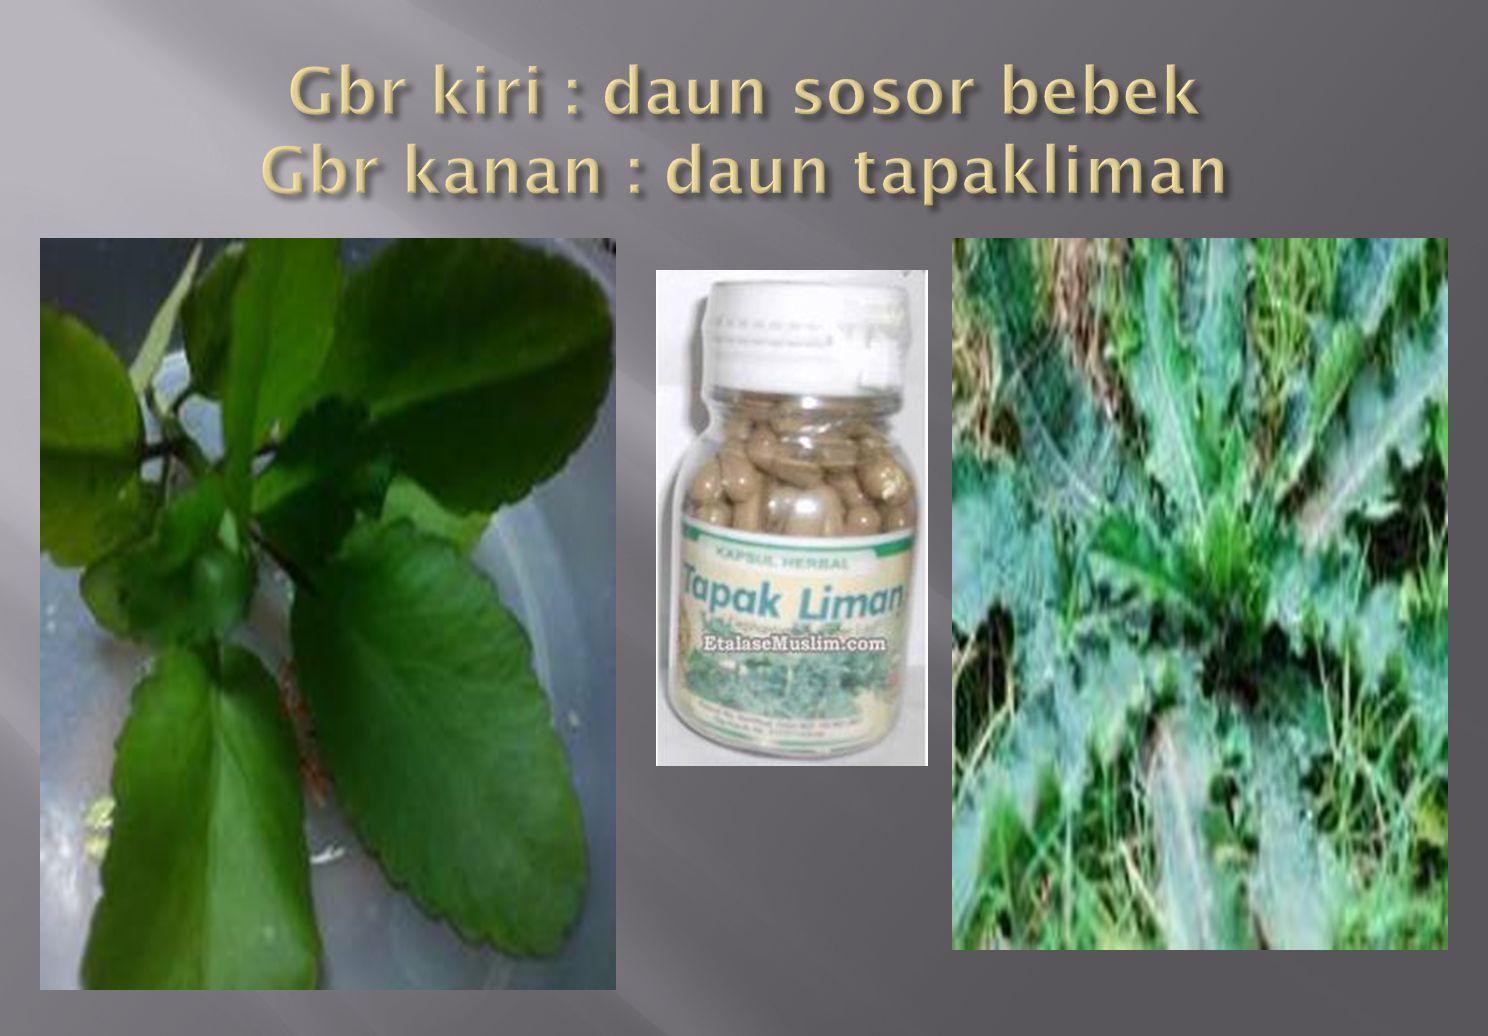 Gbr kiri : daun sosor bebek Gbr kanan : daun tapakliman